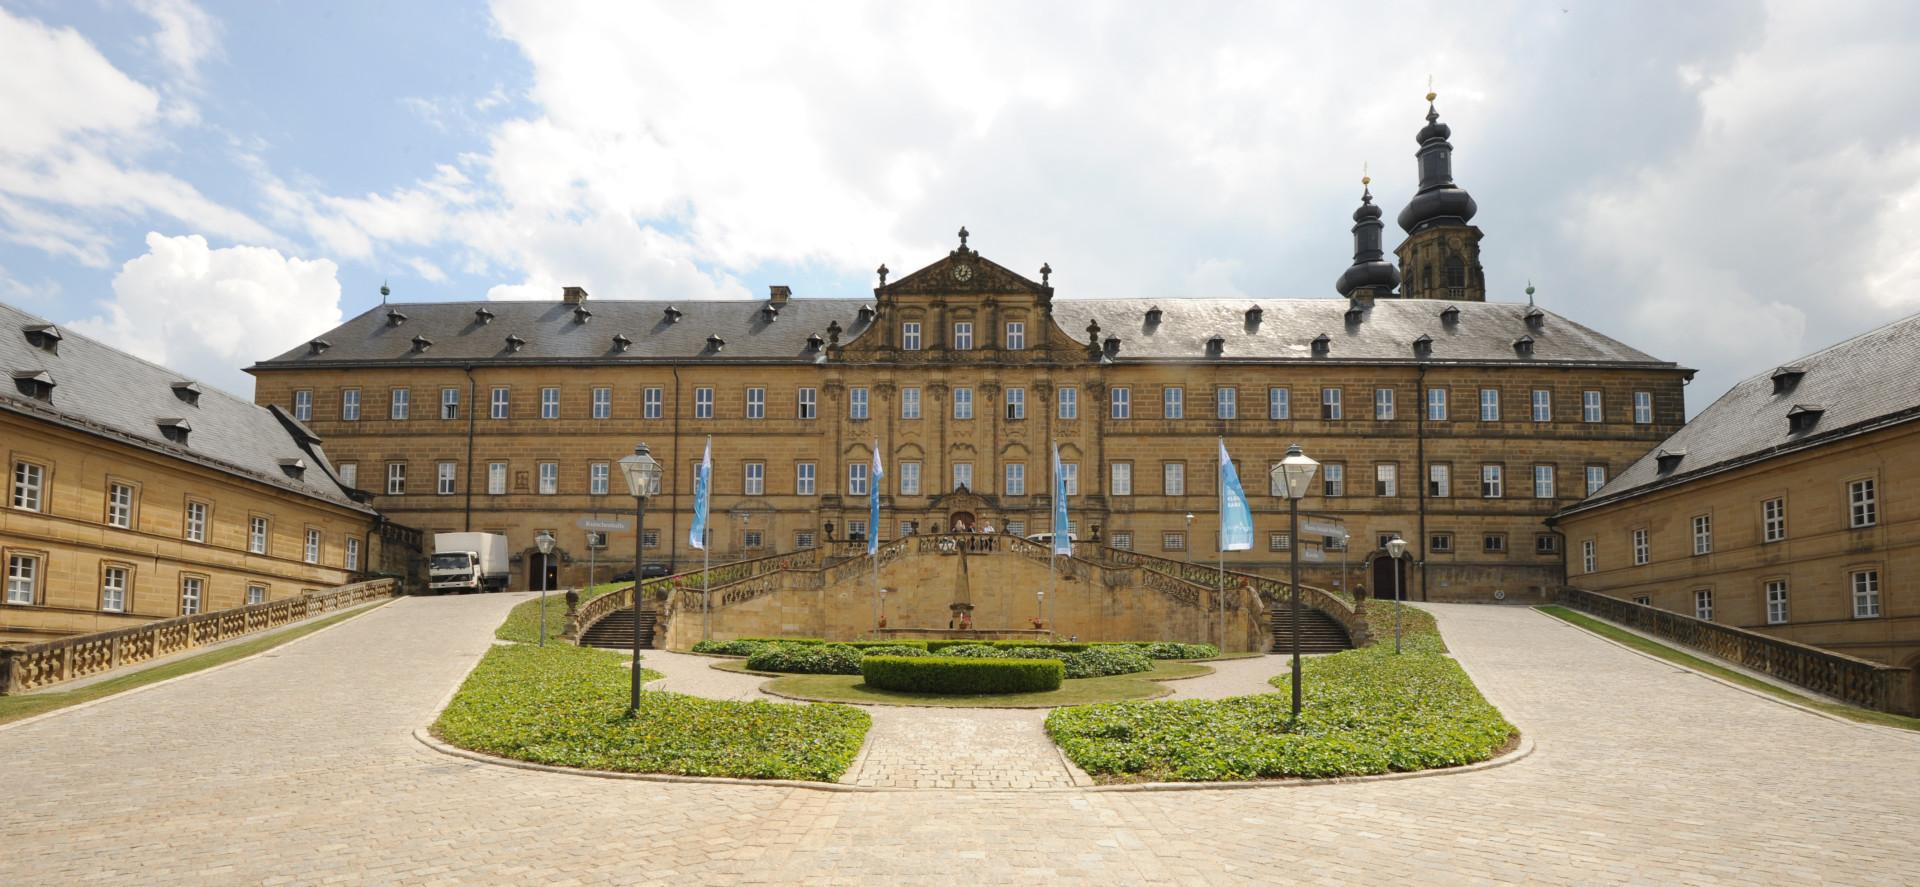 96231 Kloster Banz